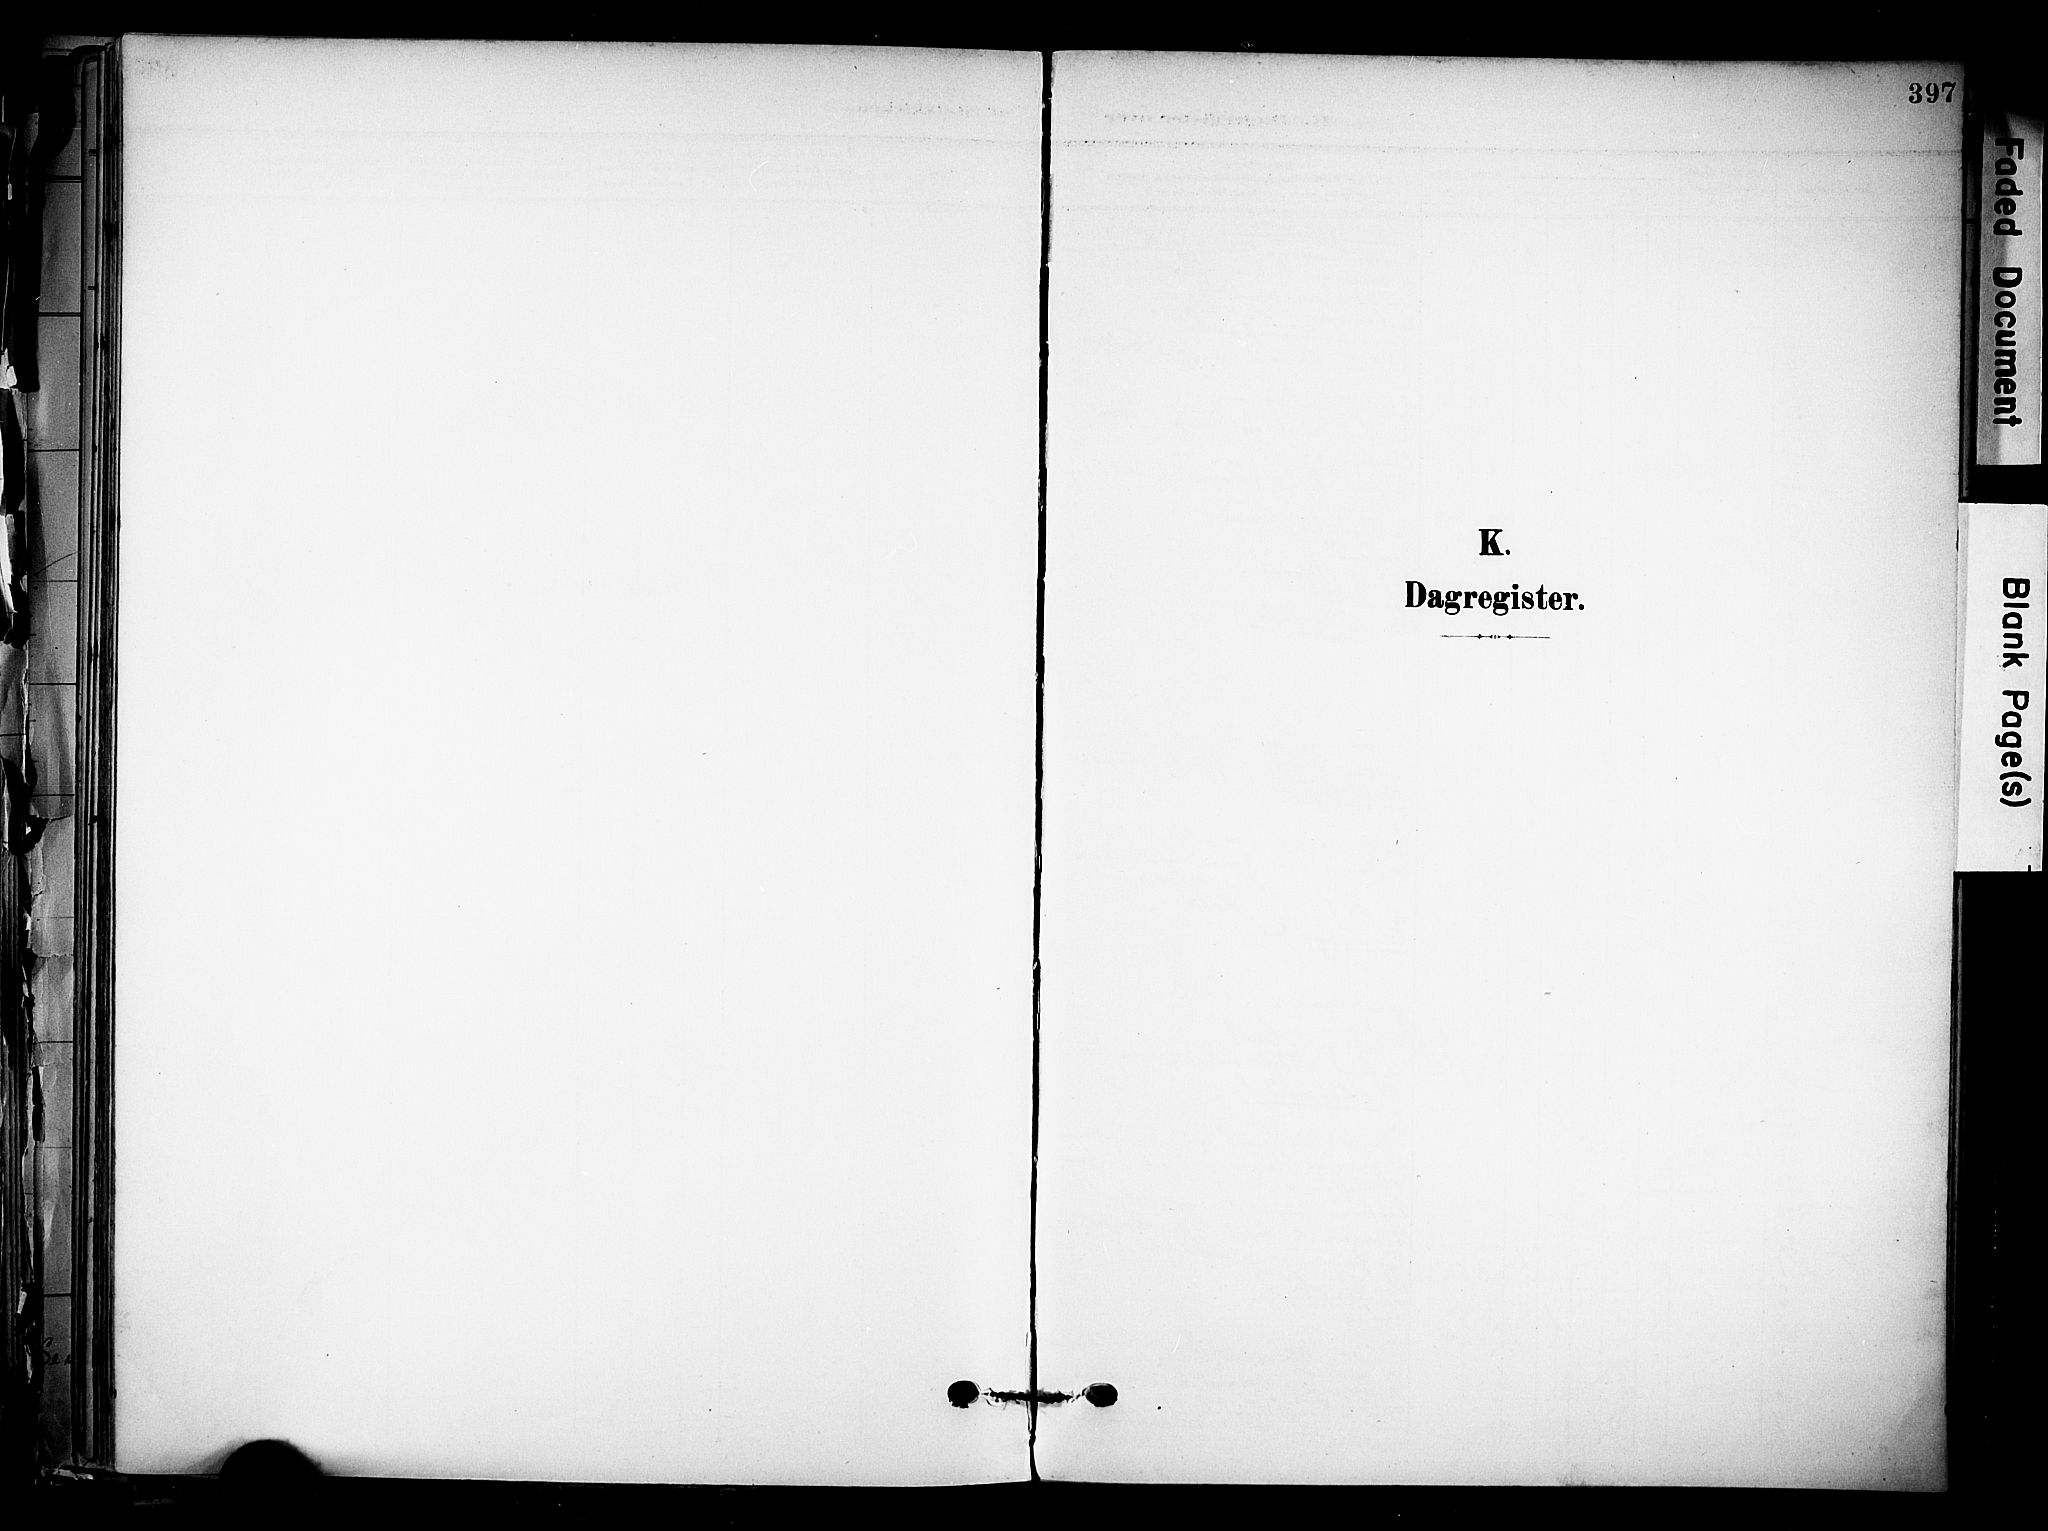 SAKO, Solum kirkebøker, F/Fa/L0011: Ministerialbok nr. I 11, 1898-1909, s. 397